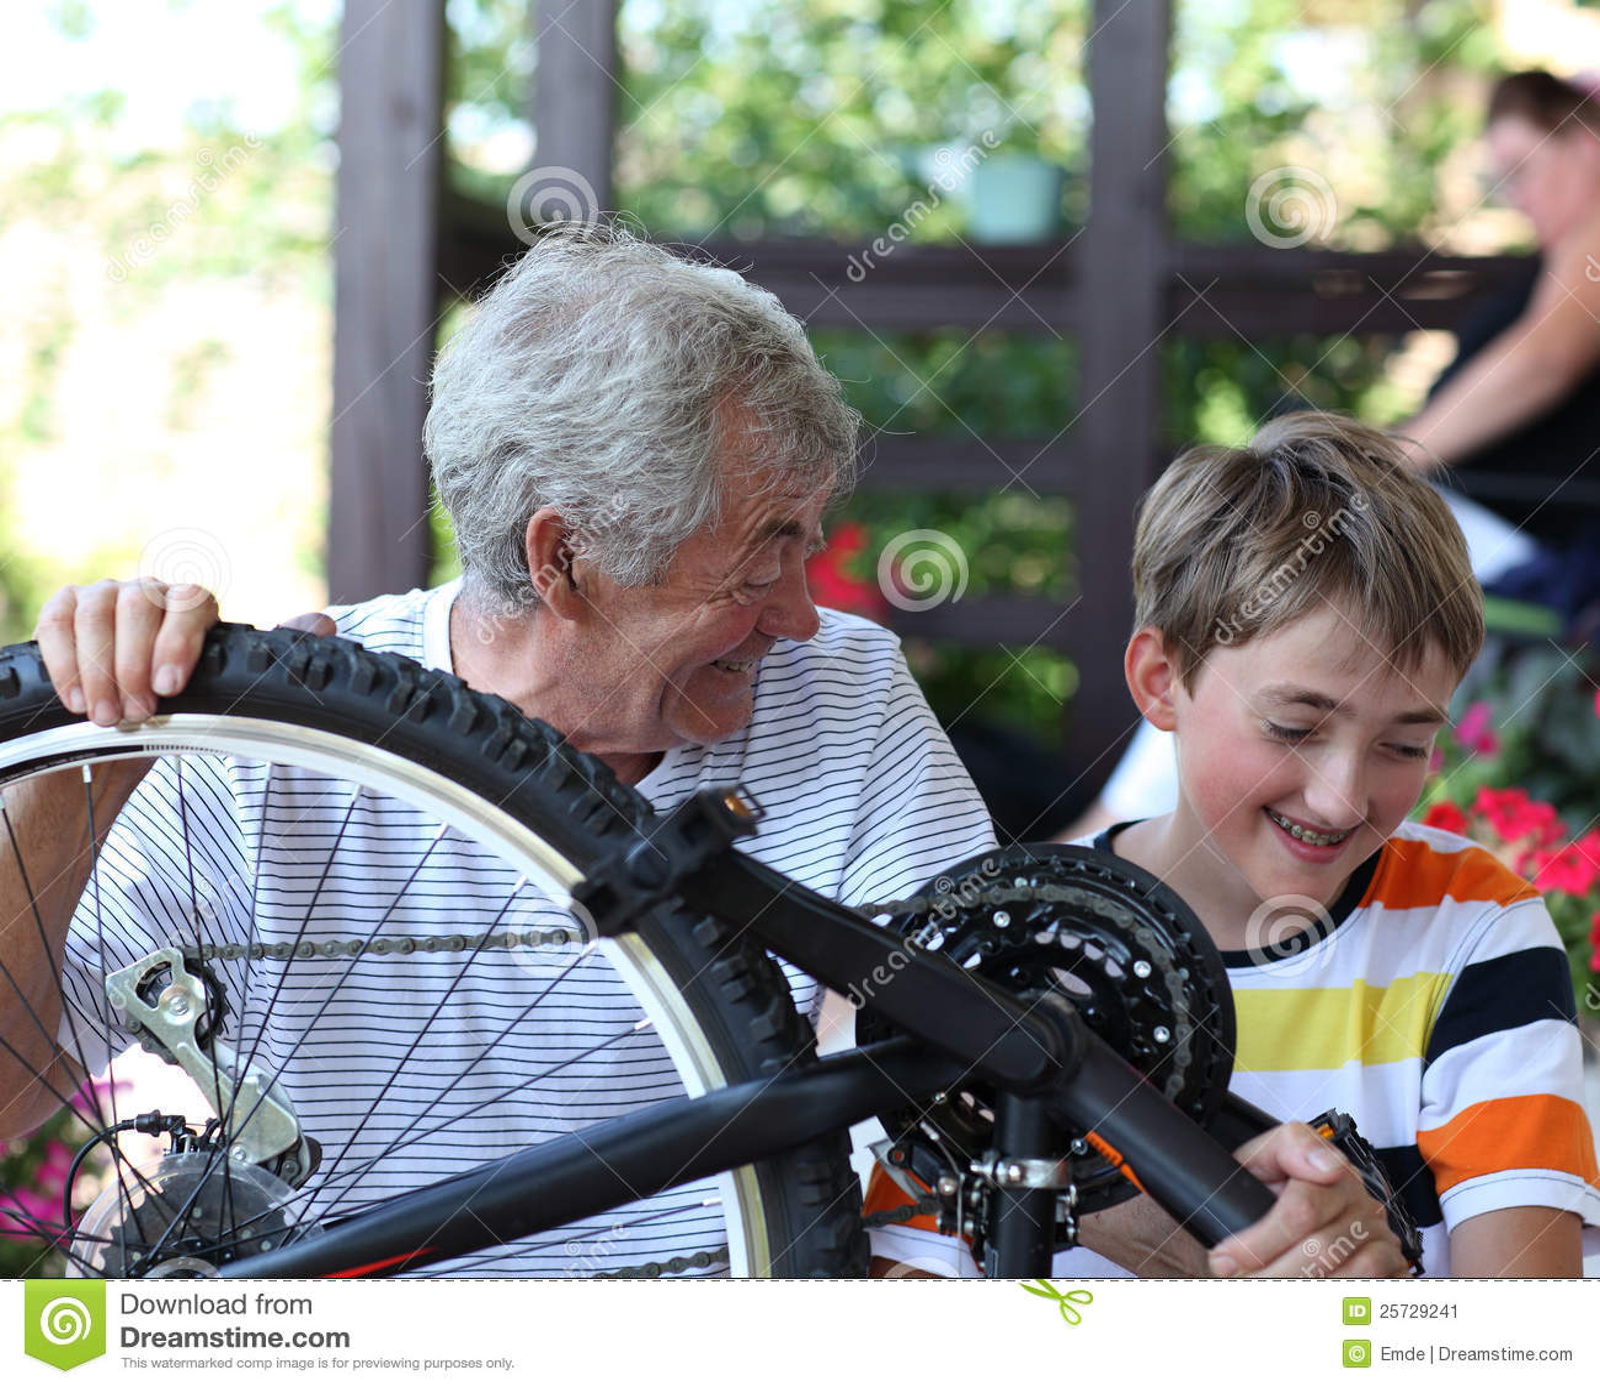 Boy and grandfather fixing bike